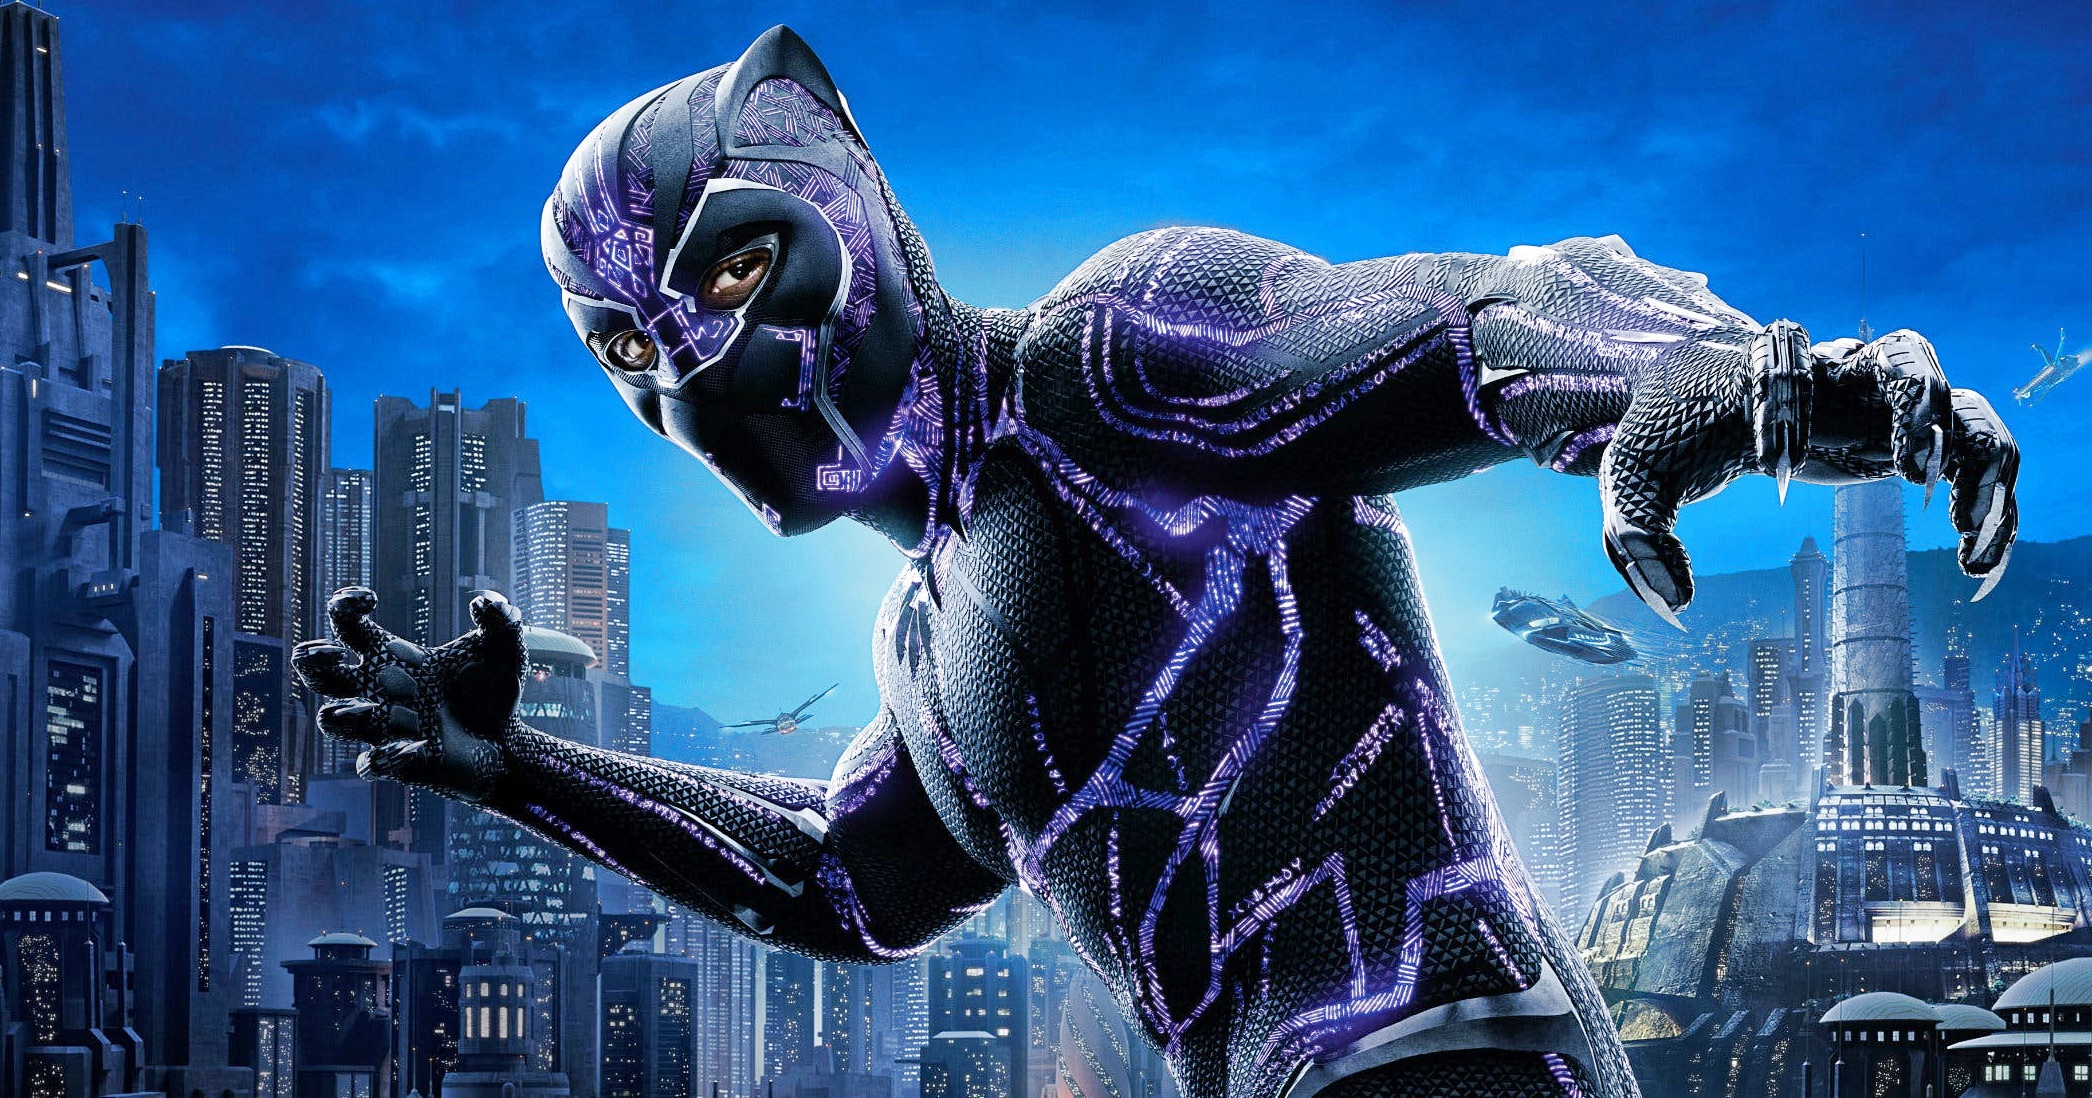 black-panther-movie-powered-costume.jpg